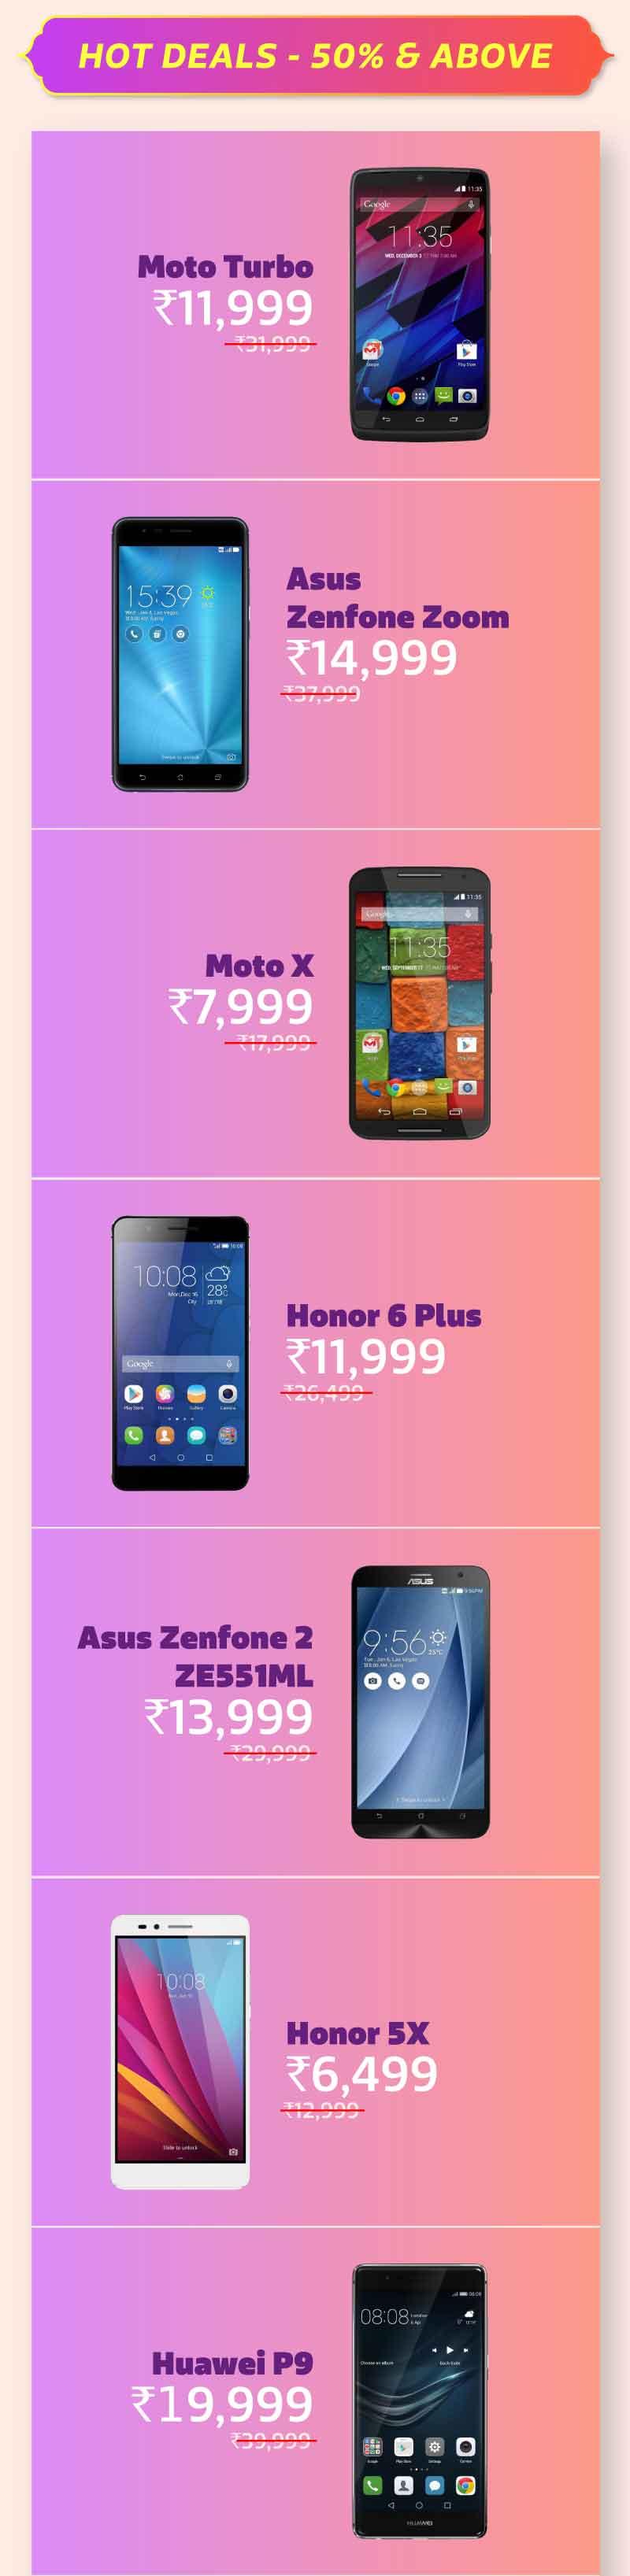 Diwali Smartphone Deals